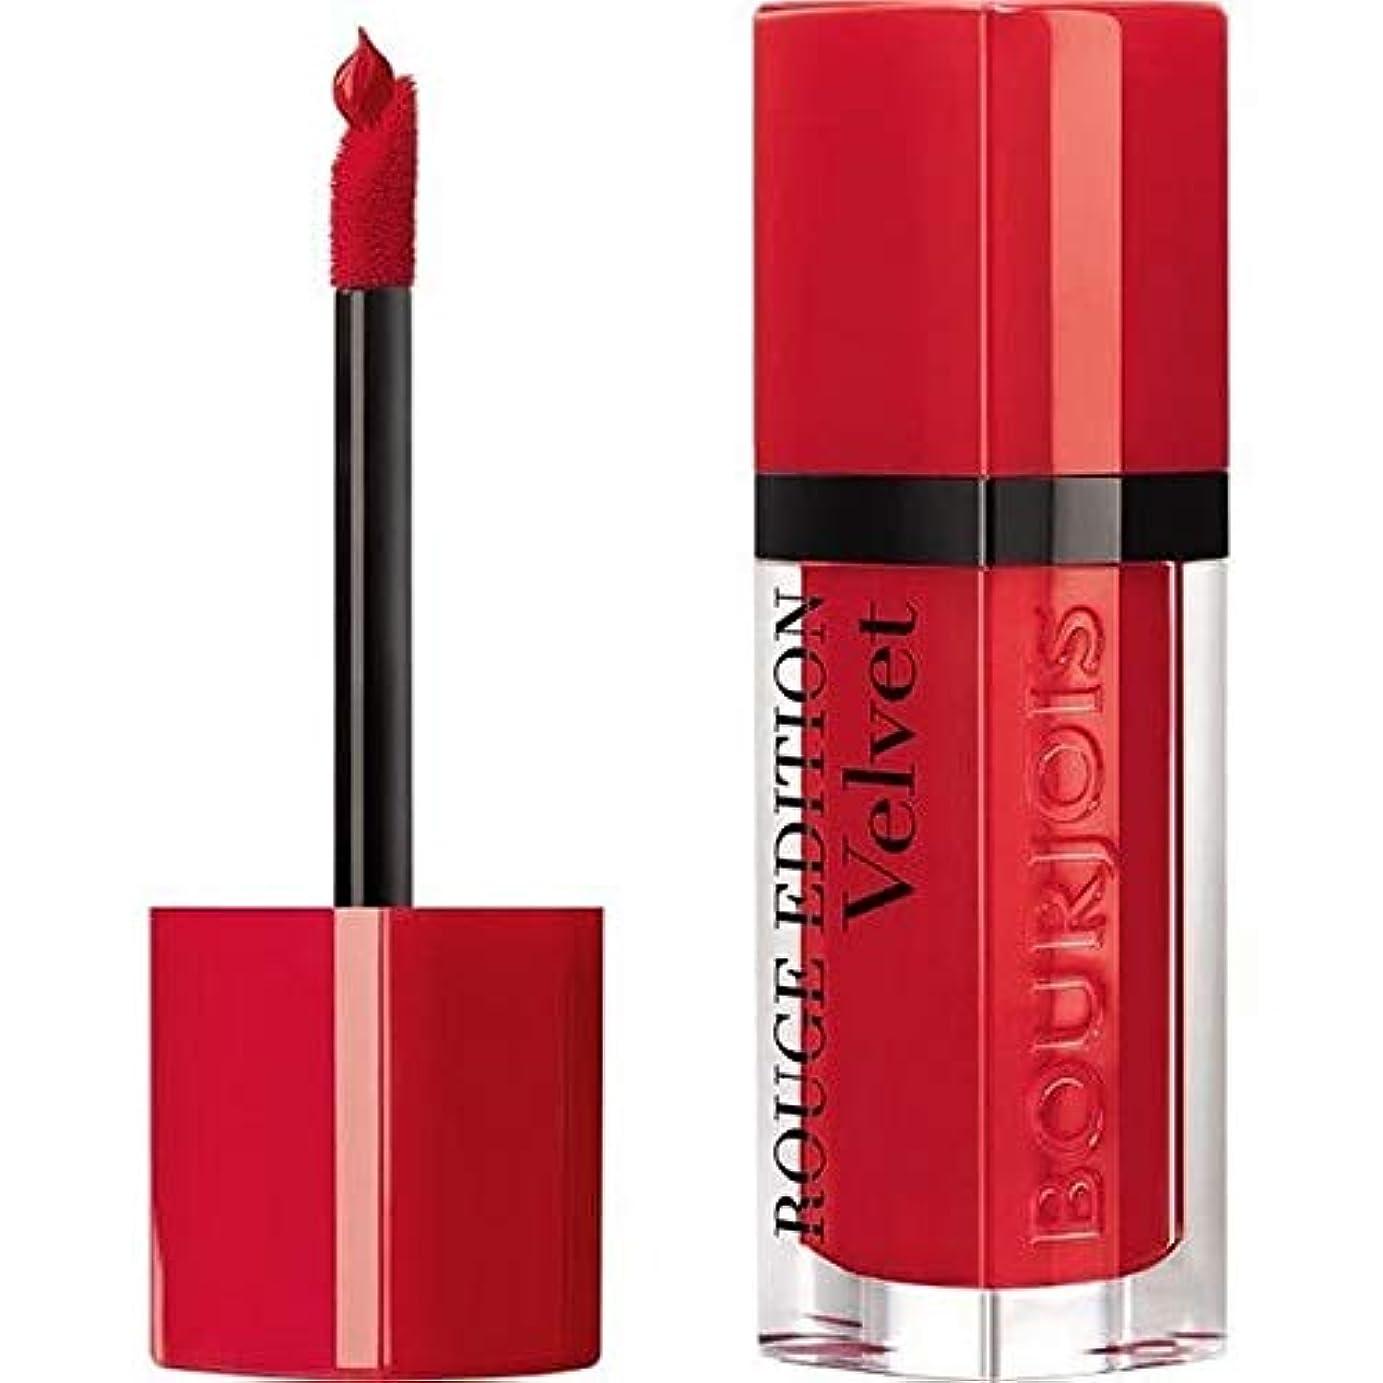 [Bourjois ] ブルジョワルージュ版のベルベットの口紅唐辛子3 - Bourjois Rouge Edition Velvet lipstick Hot Pepper 3 [並行輸入品]